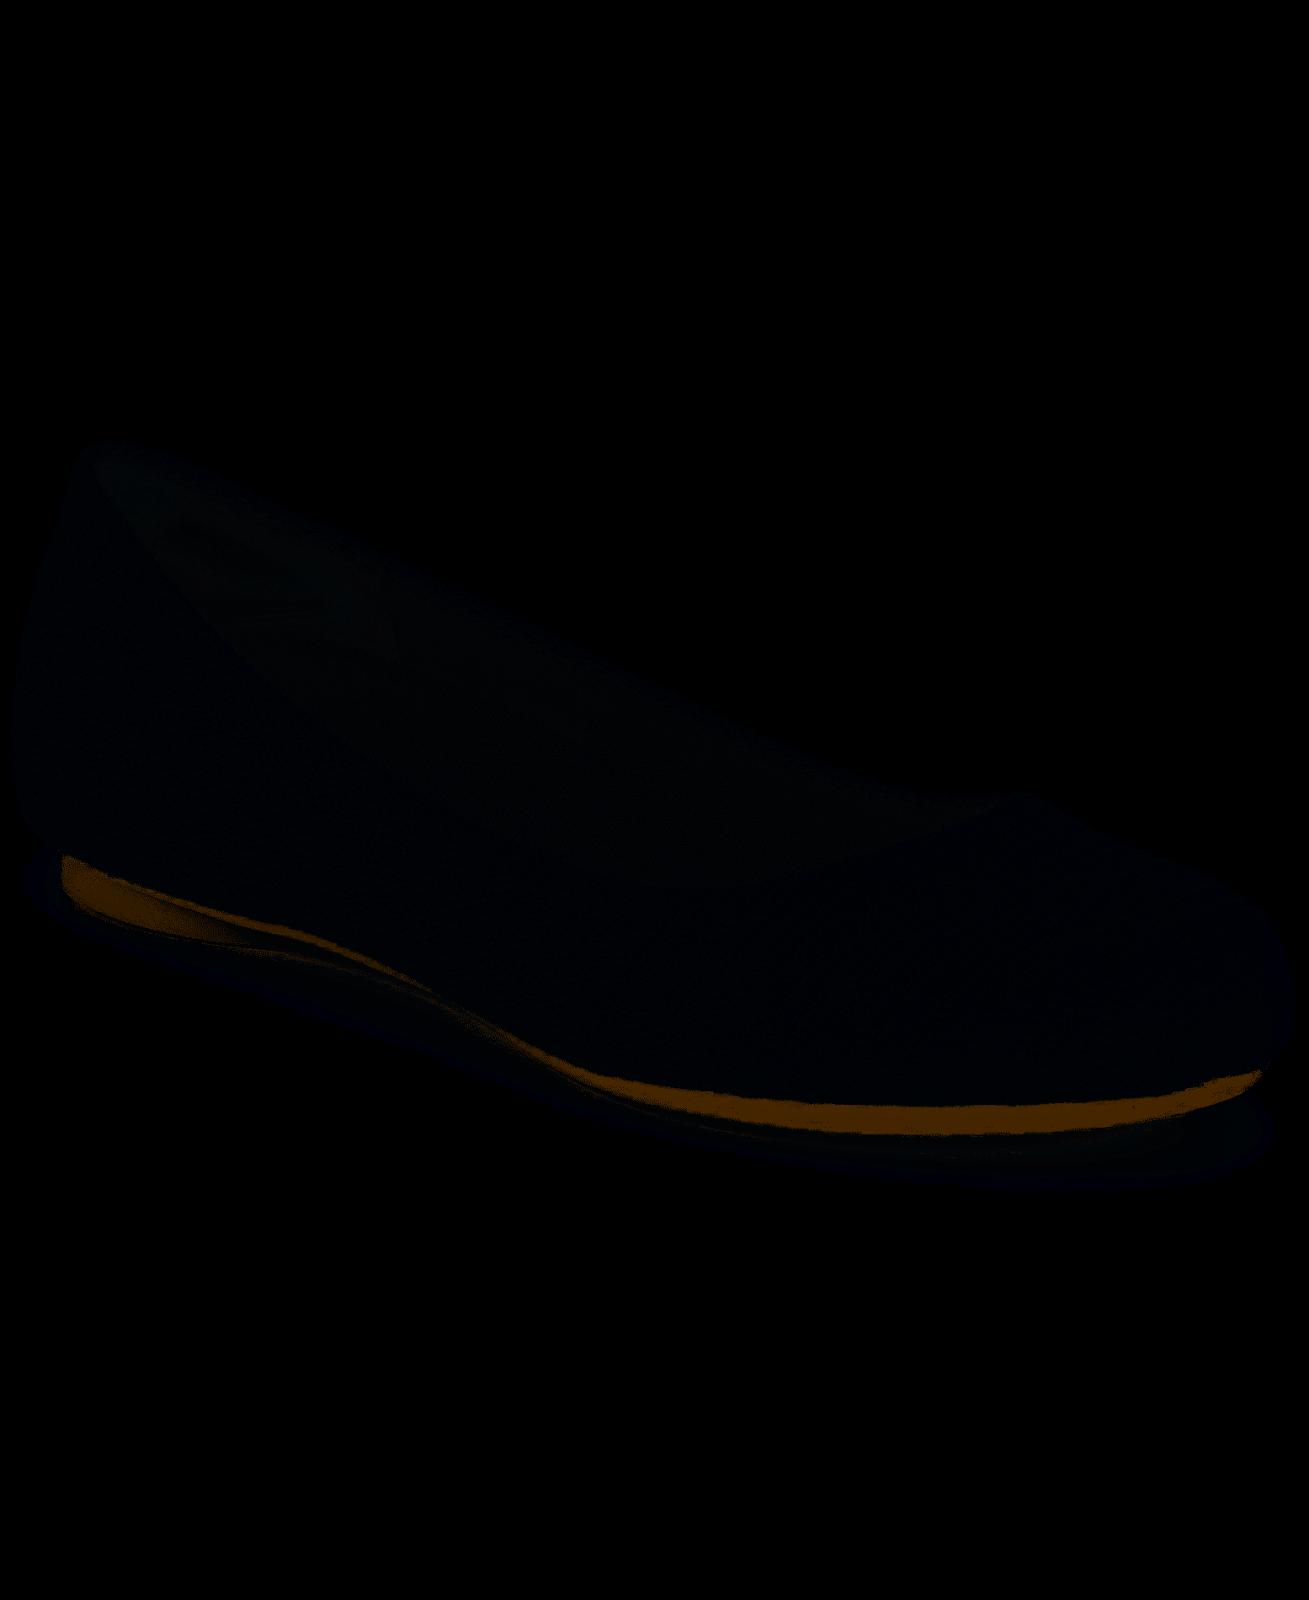 Dr. Scholl's Women's Friendly2 Grey Ballet Flat shoes Size 6.5 or 7.5 Medium